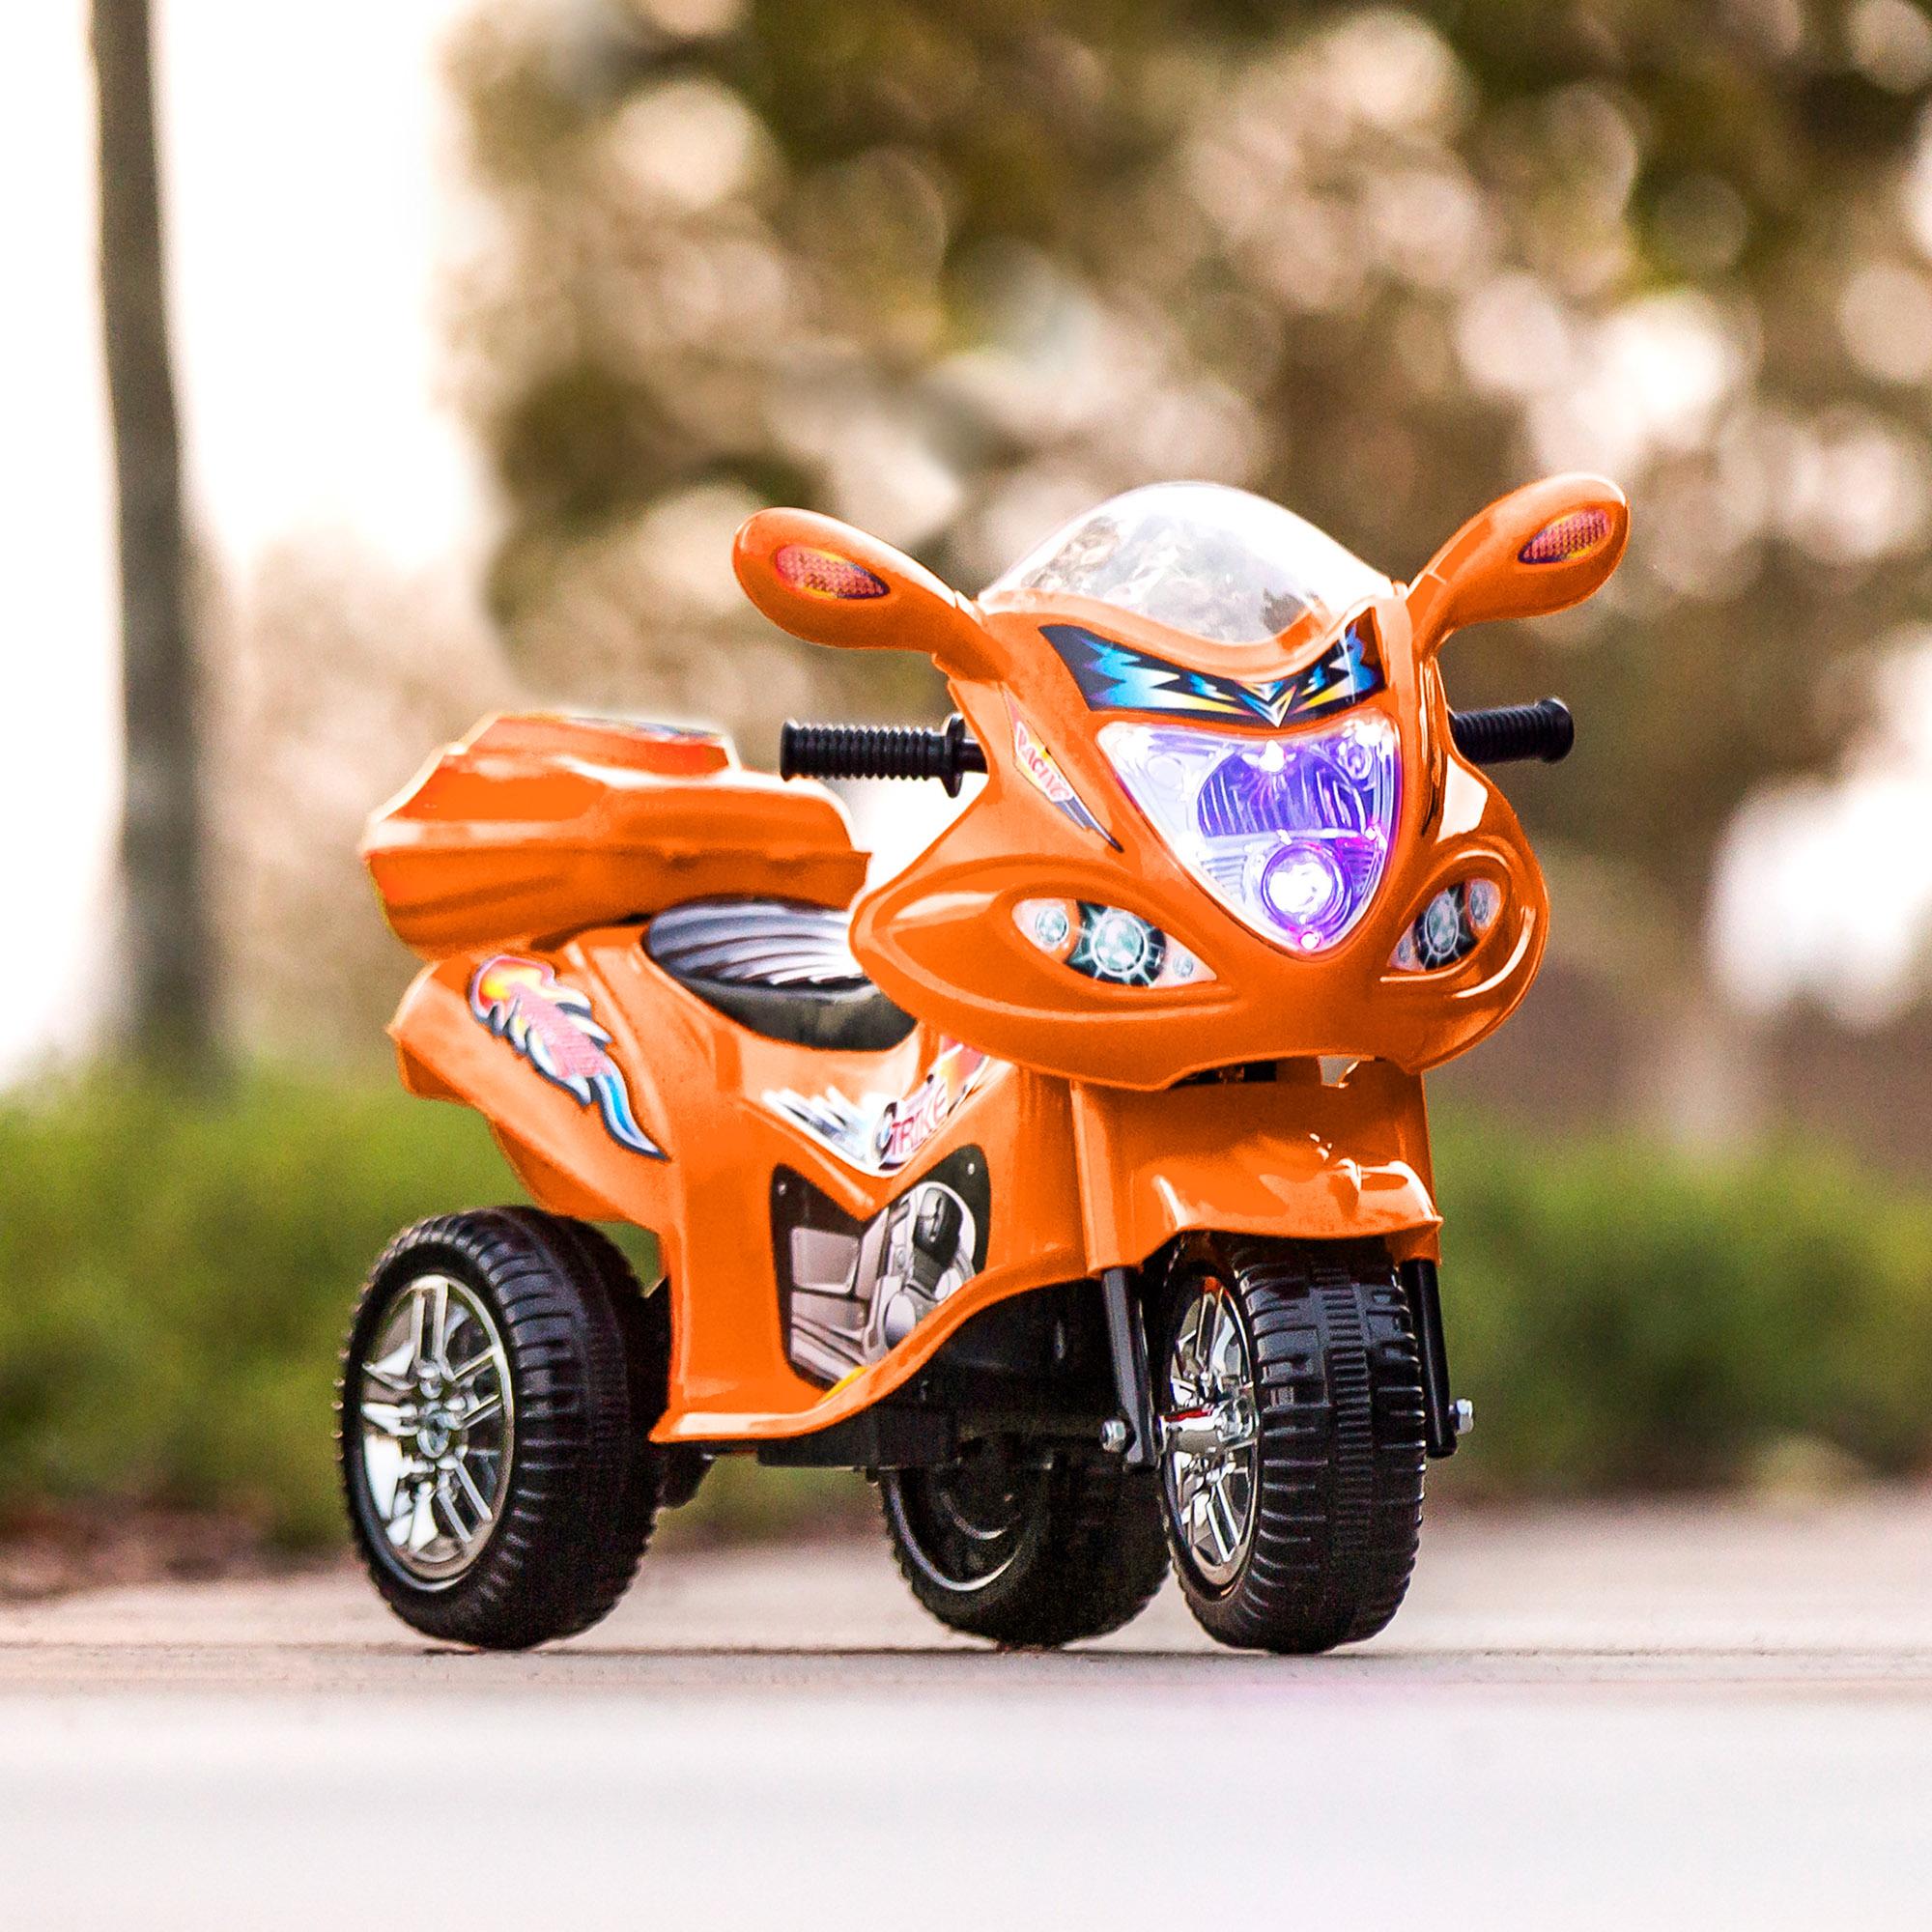 toy motorcycle ride wheel lights music 6v storage orange led bcp choice horn battery powered amazon